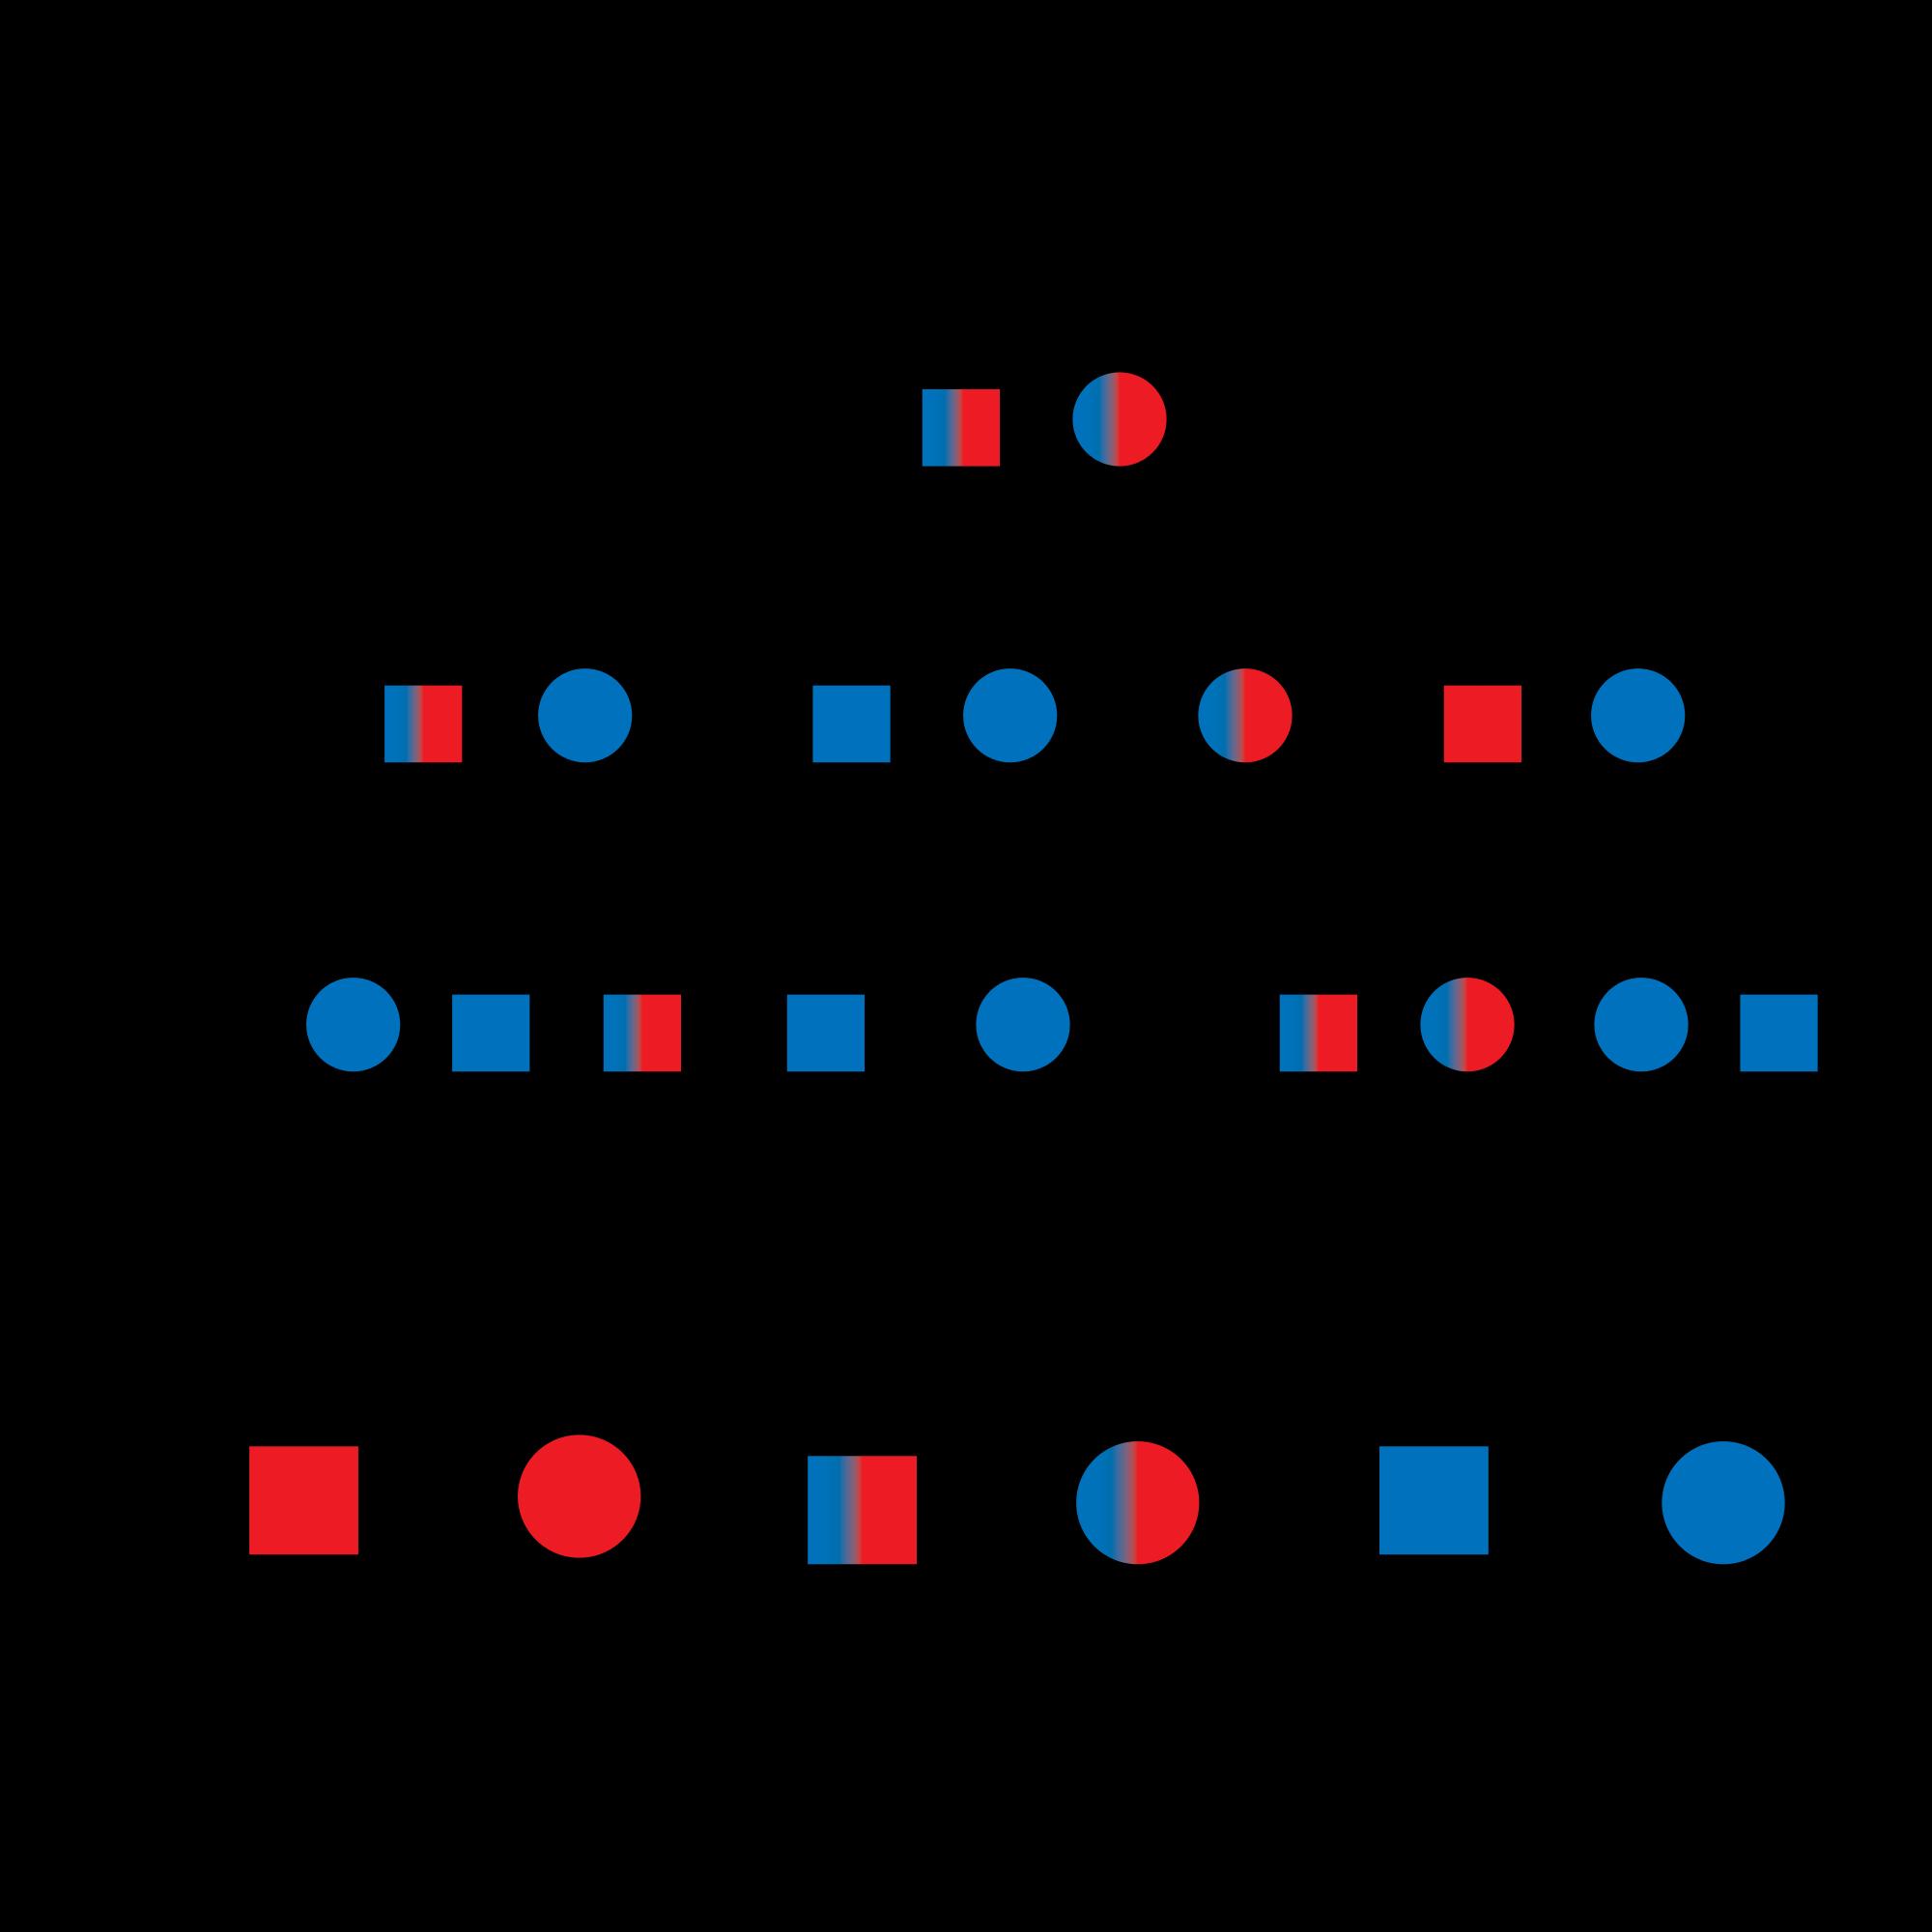 pedigree examples